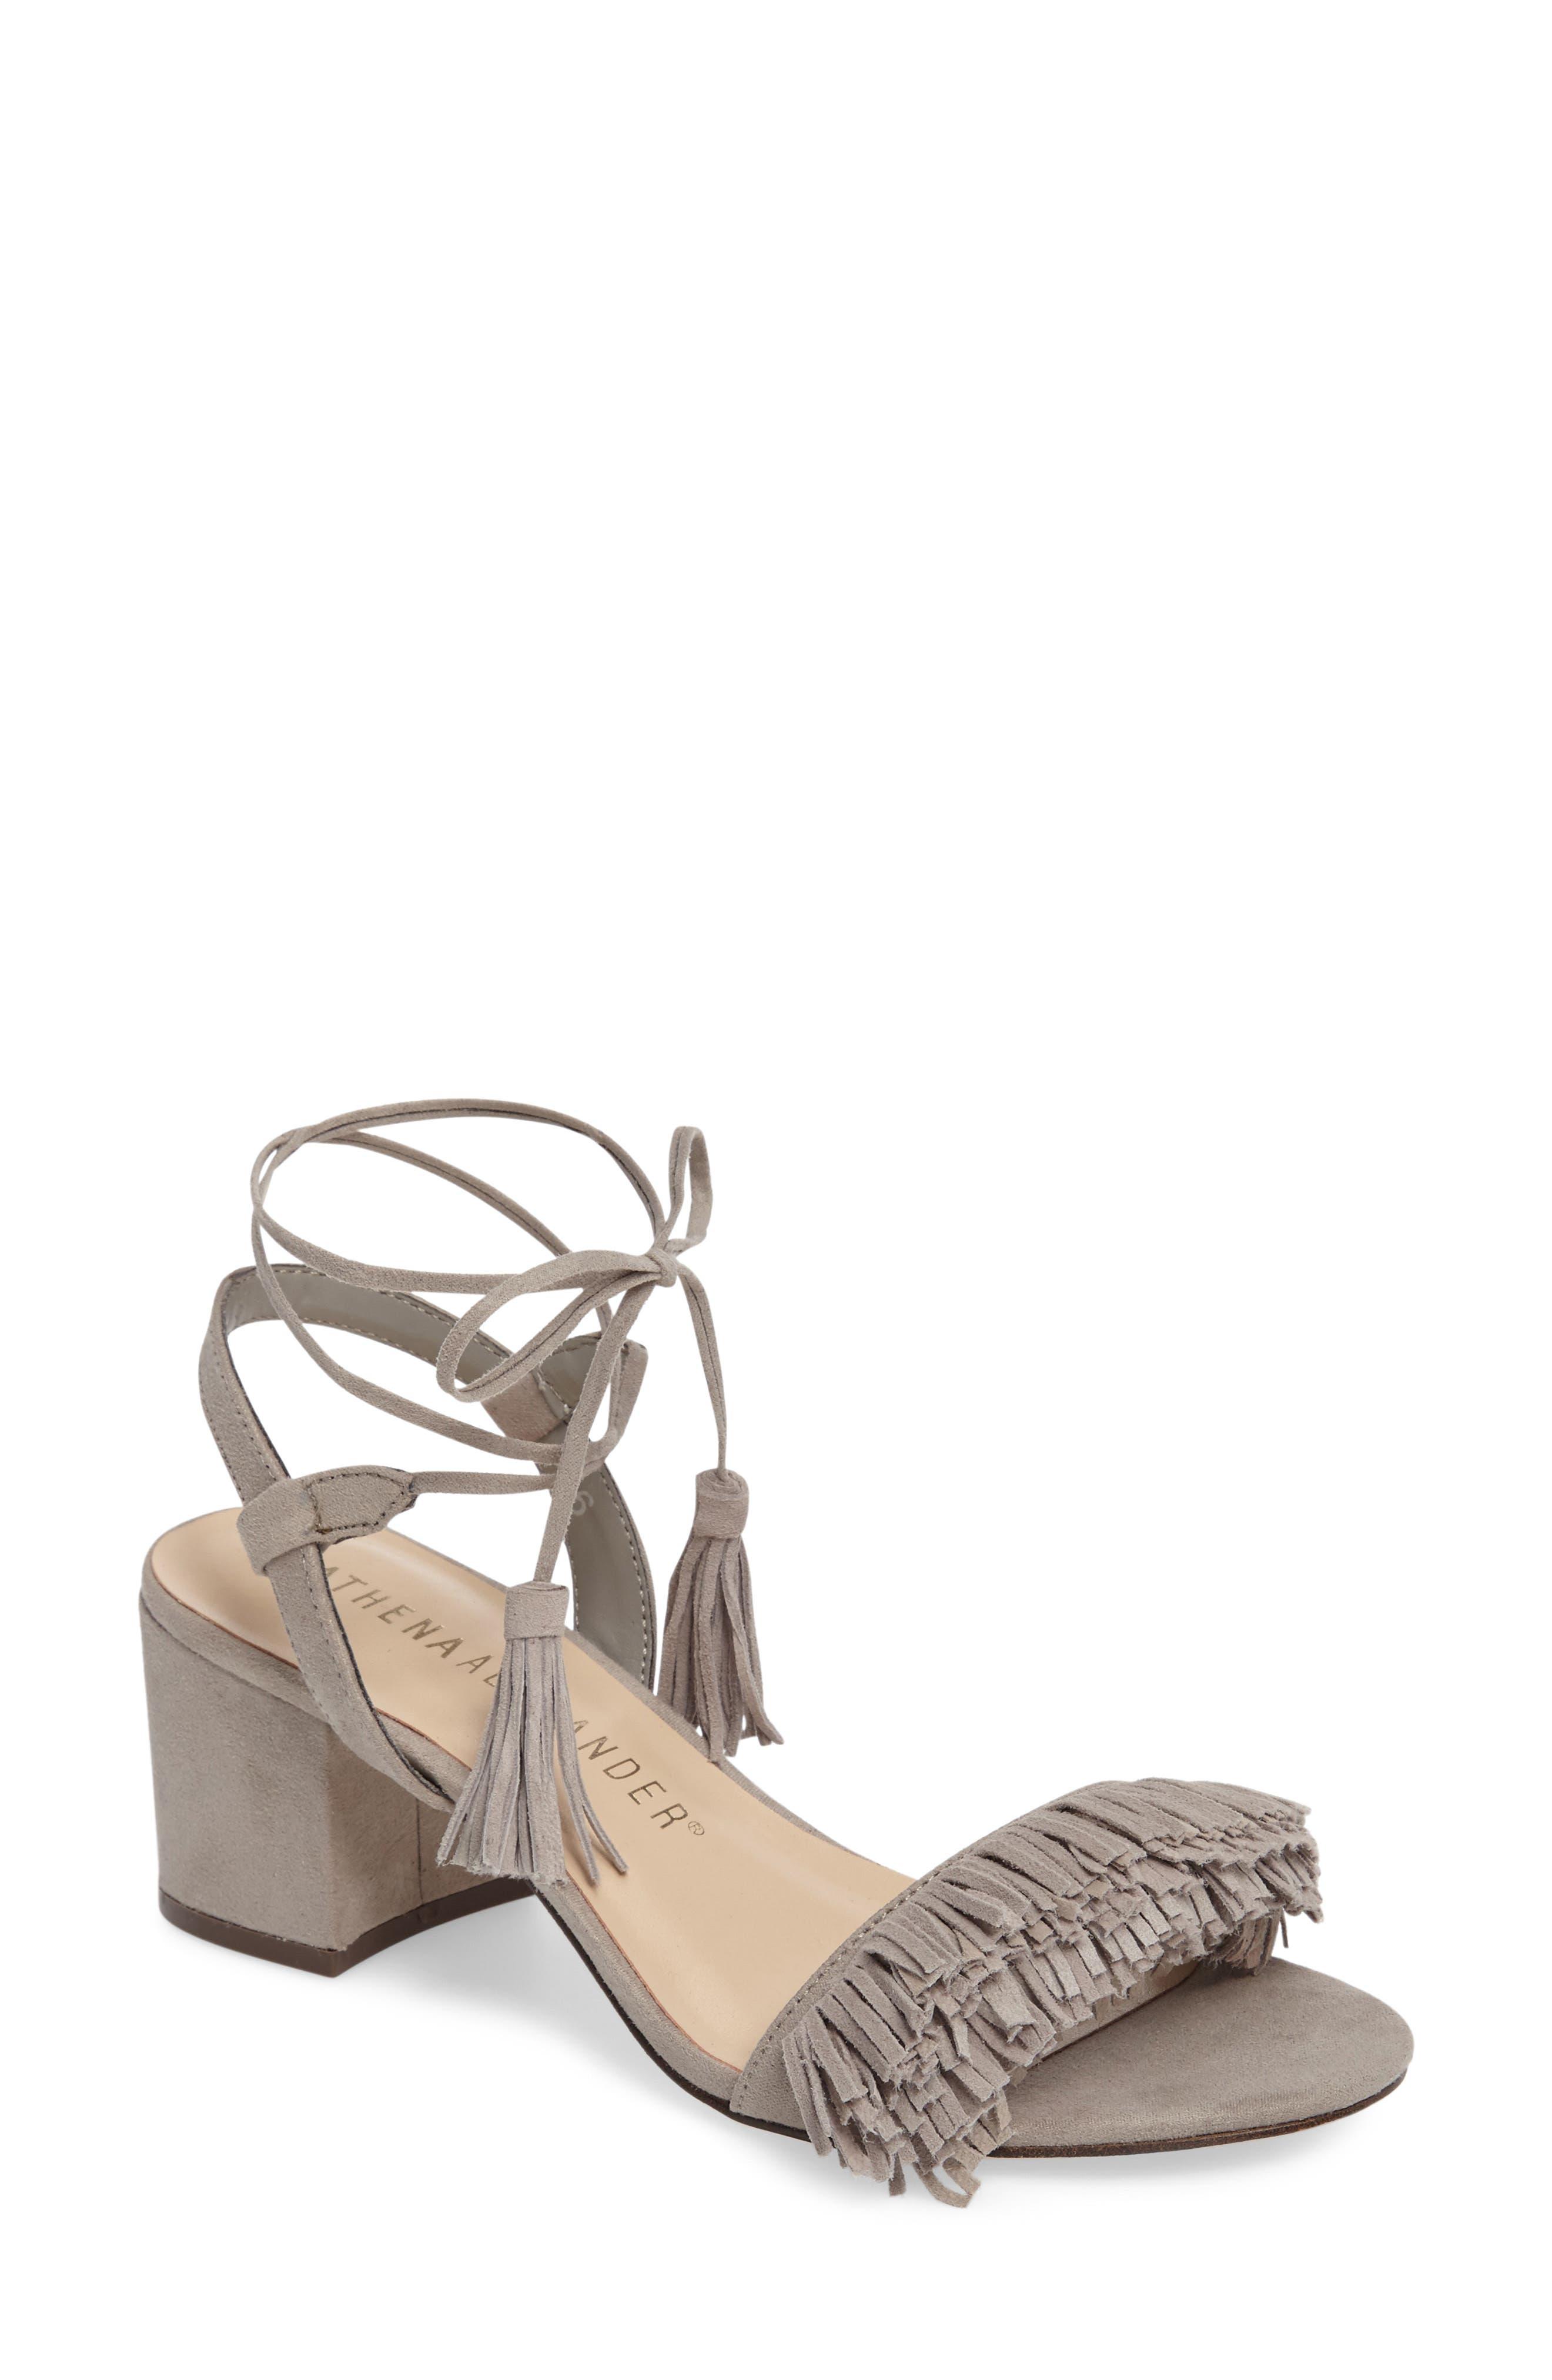 ATHENA ALEXANDER Fringed Ankle Wrap Sandal